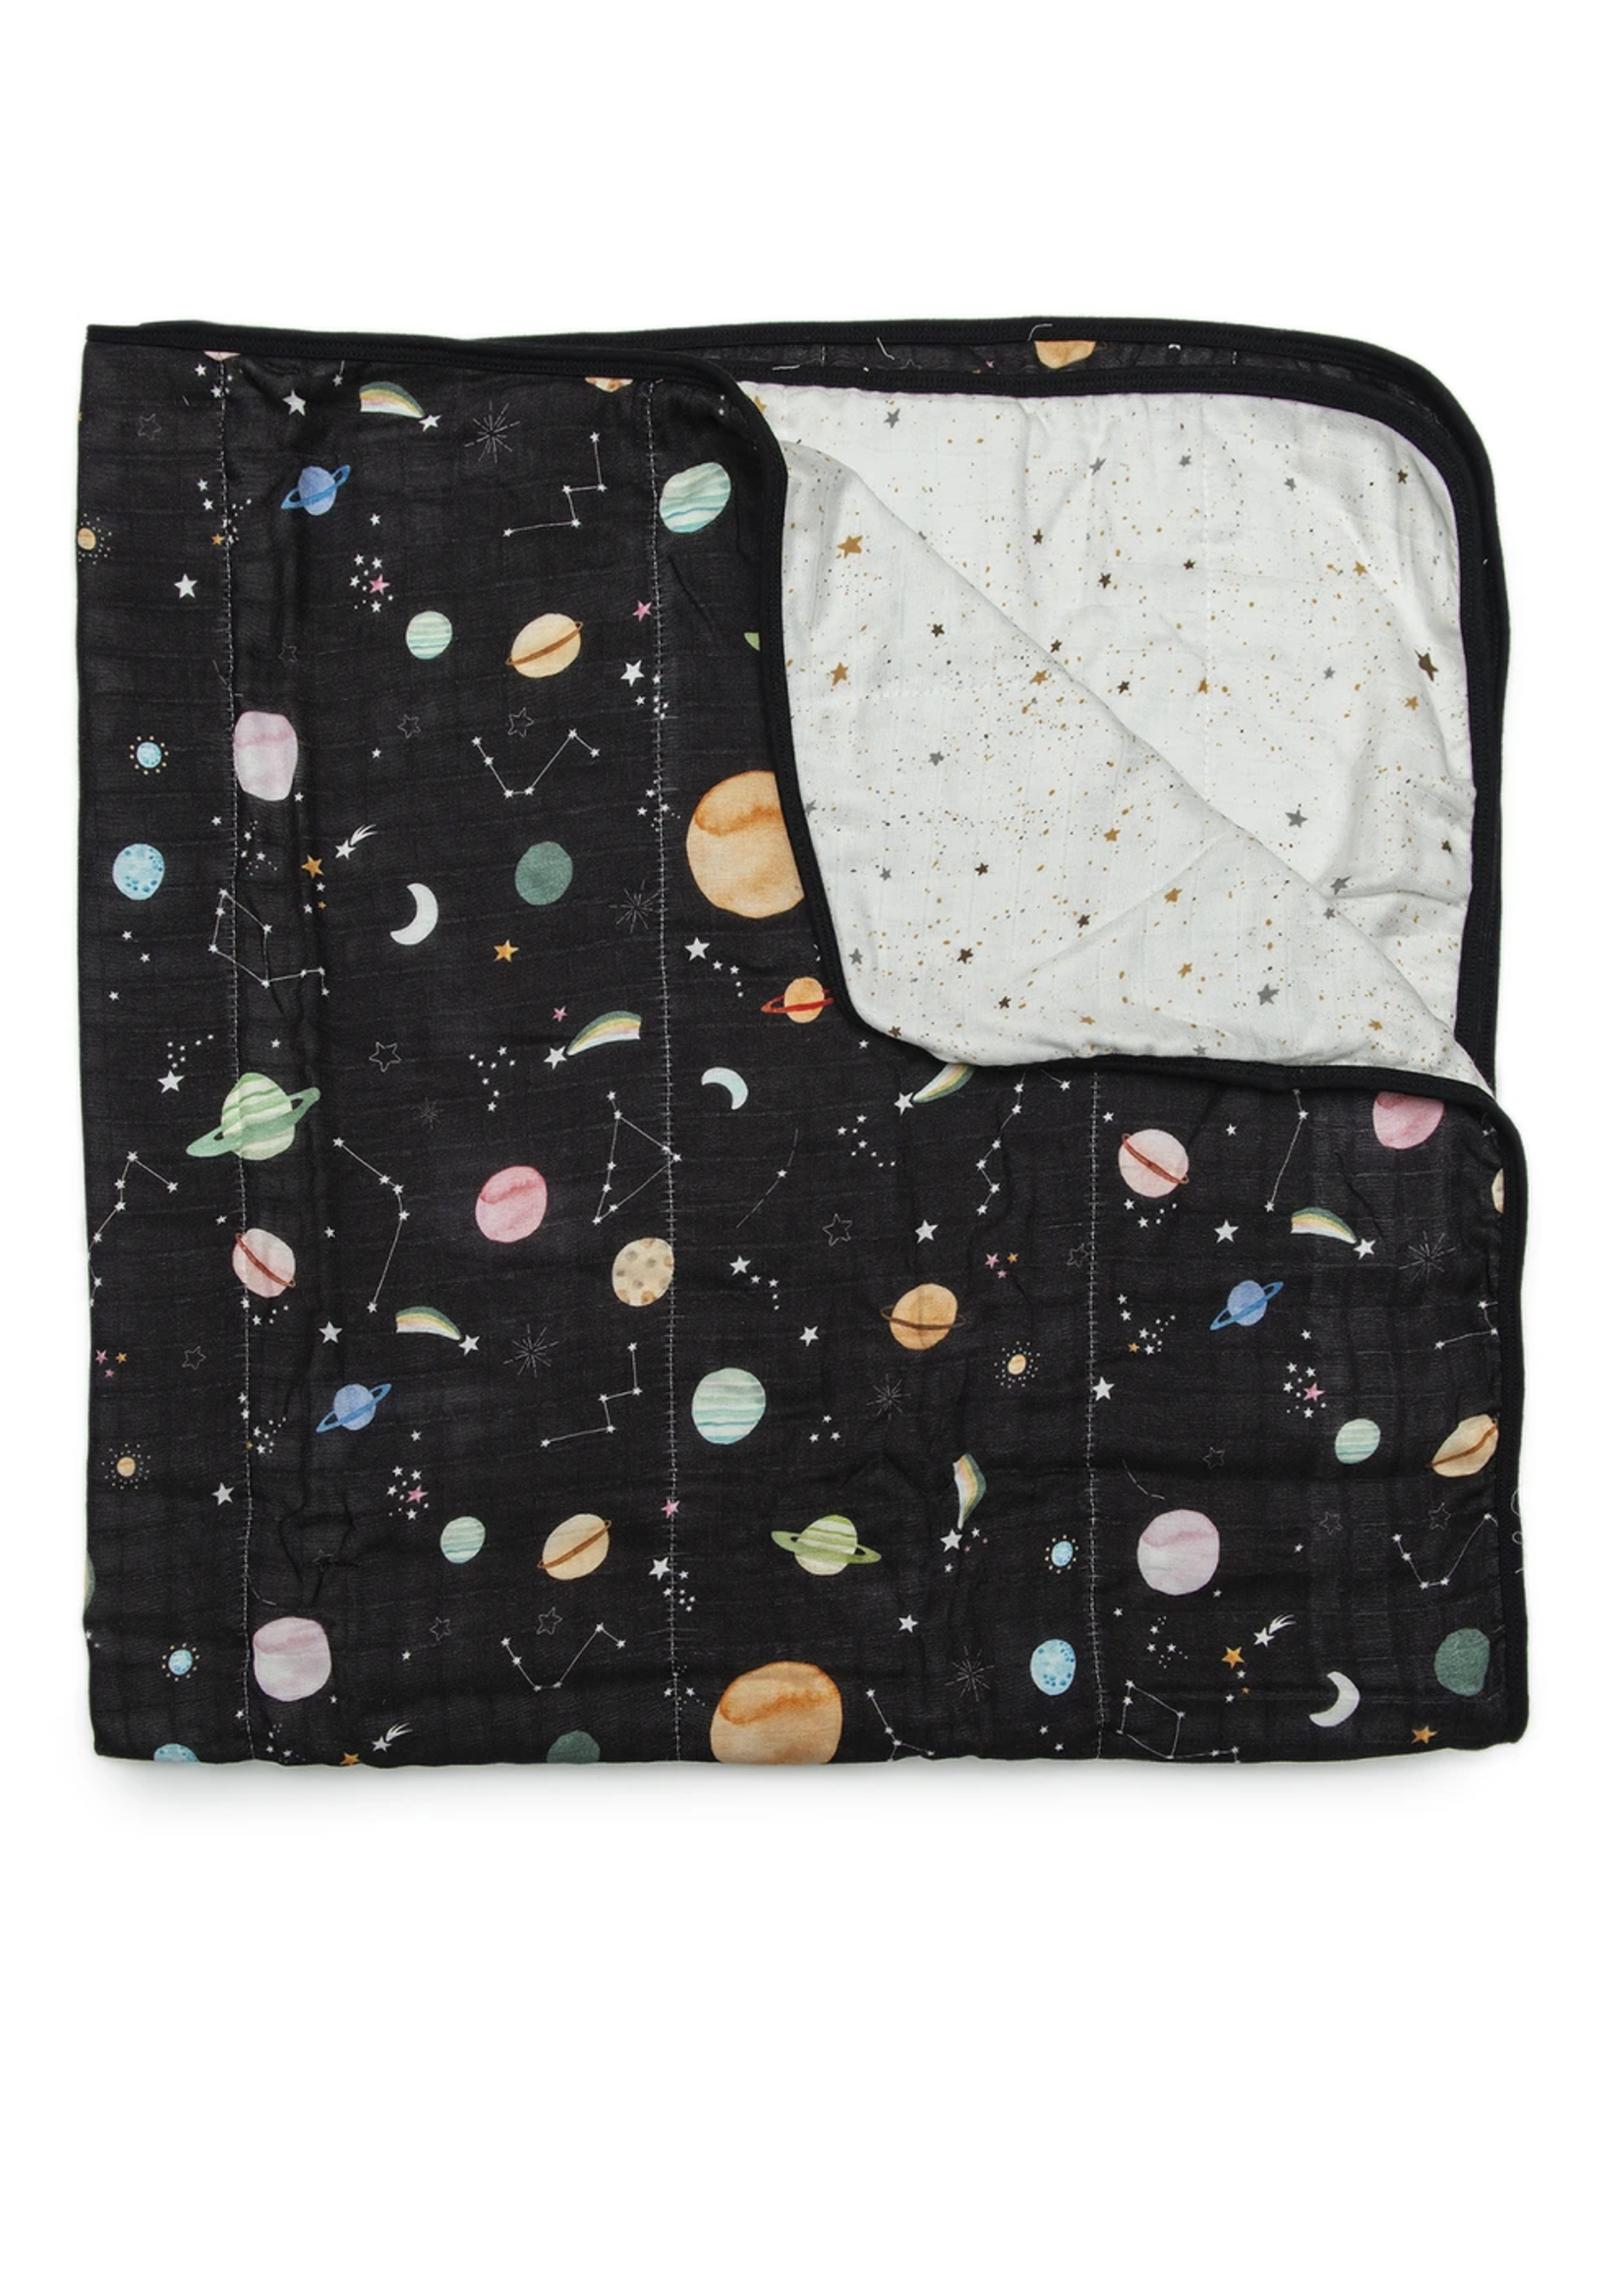 Lou Lou Lollipop Muslin Quilt Blanket | Planets